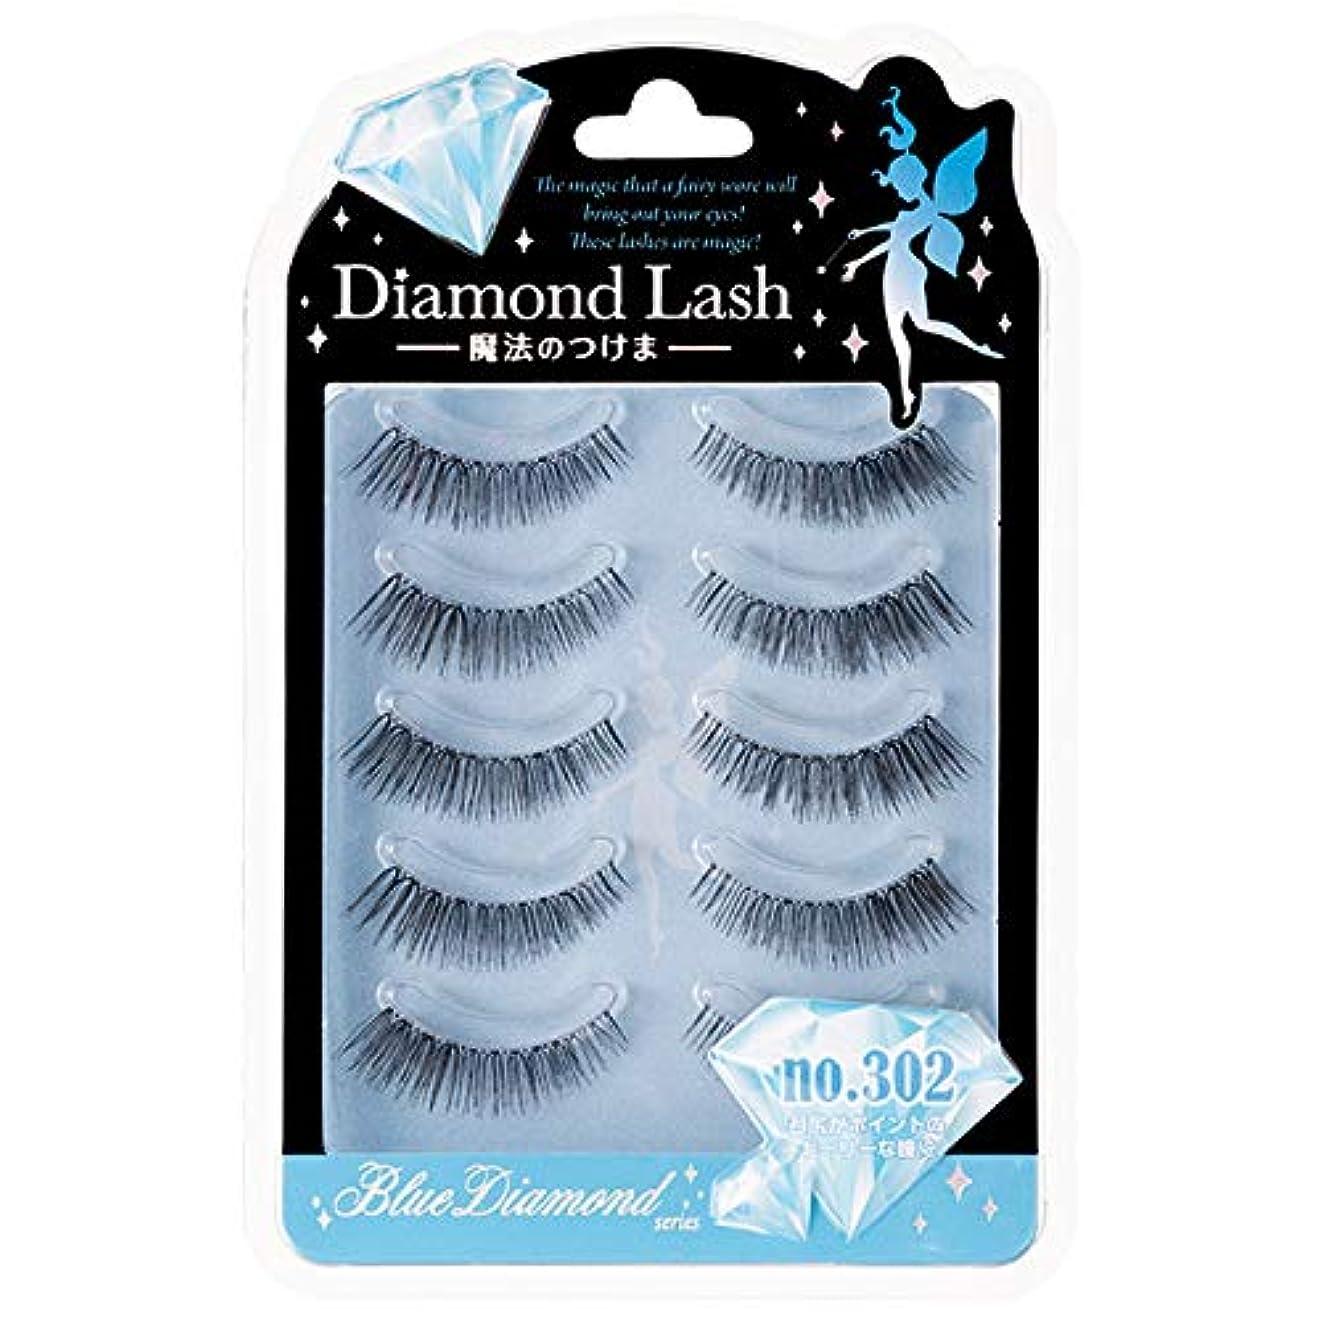 Diamond Lash(ダイヤモンドラッシュ) ブルー no.302 5ペア